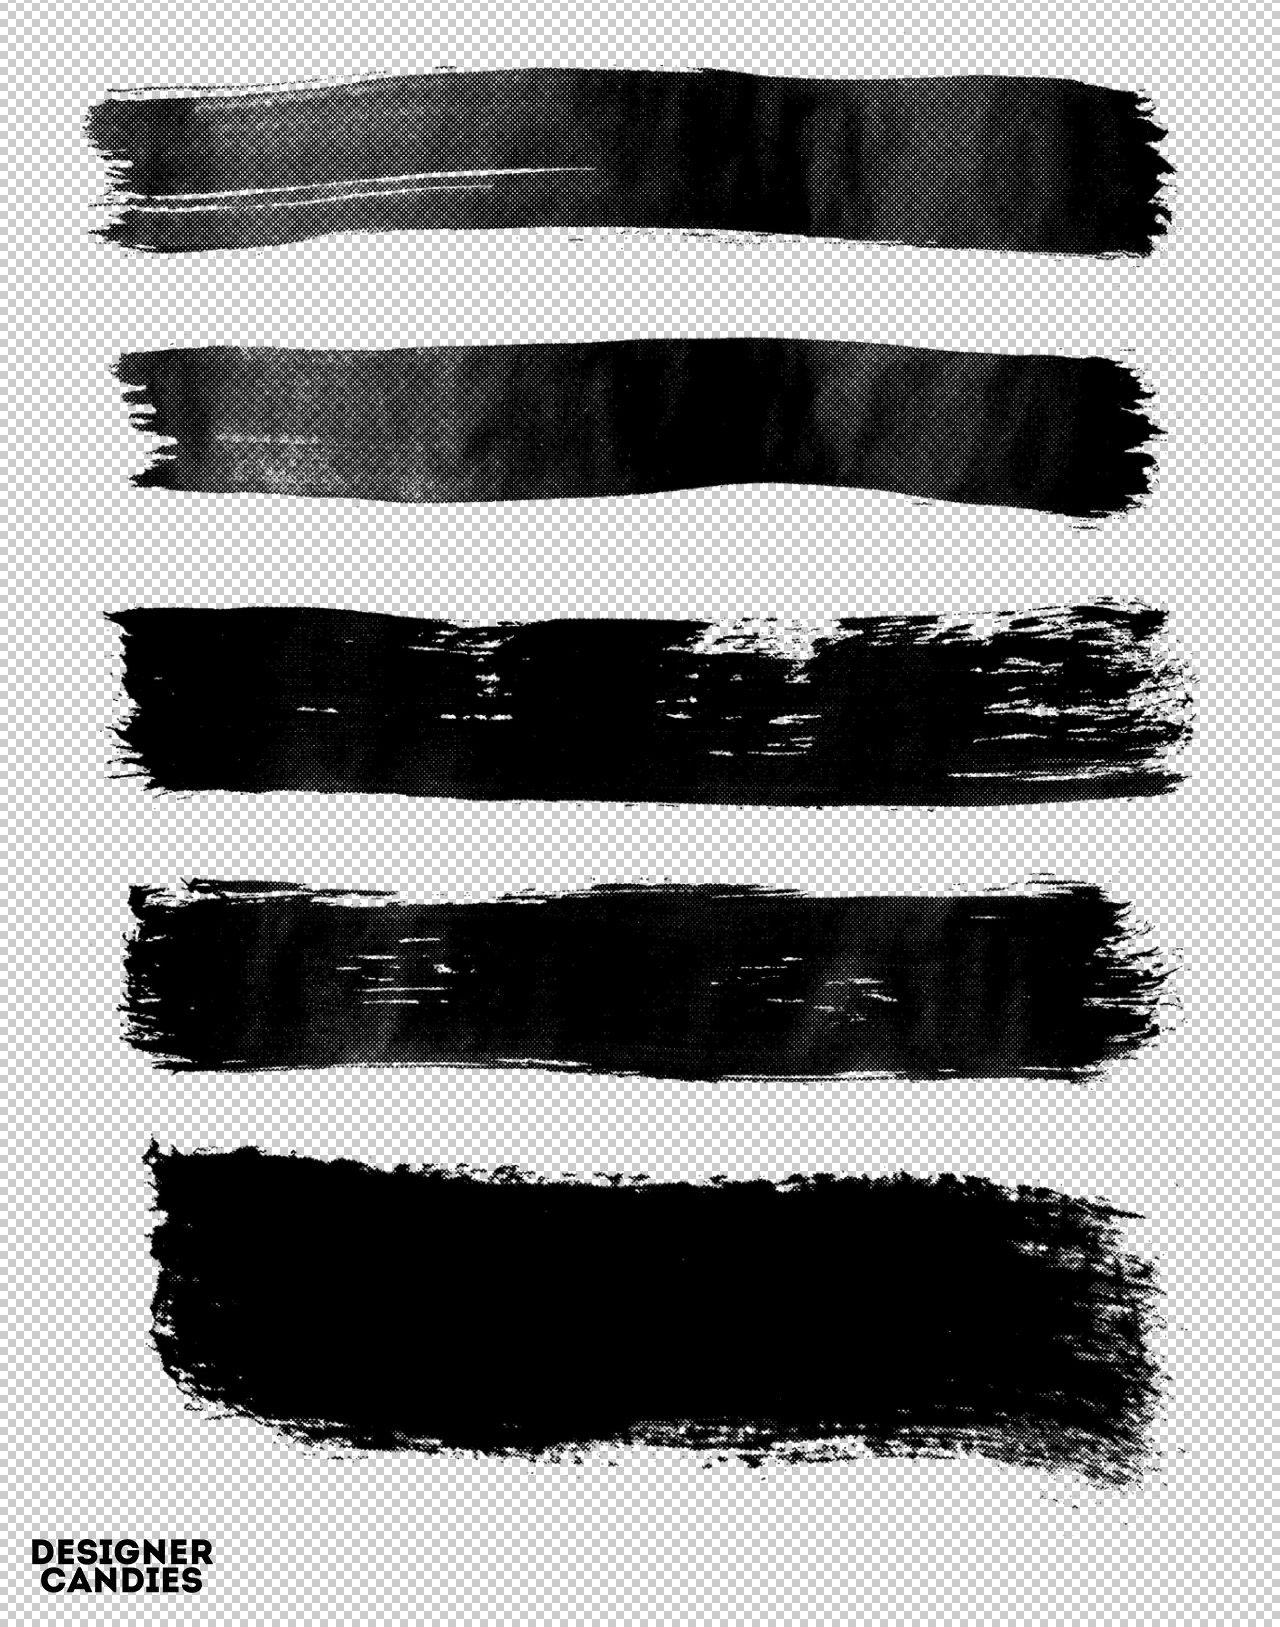 21 Distressed Halftone Brush Strokes Photoshop Imagens